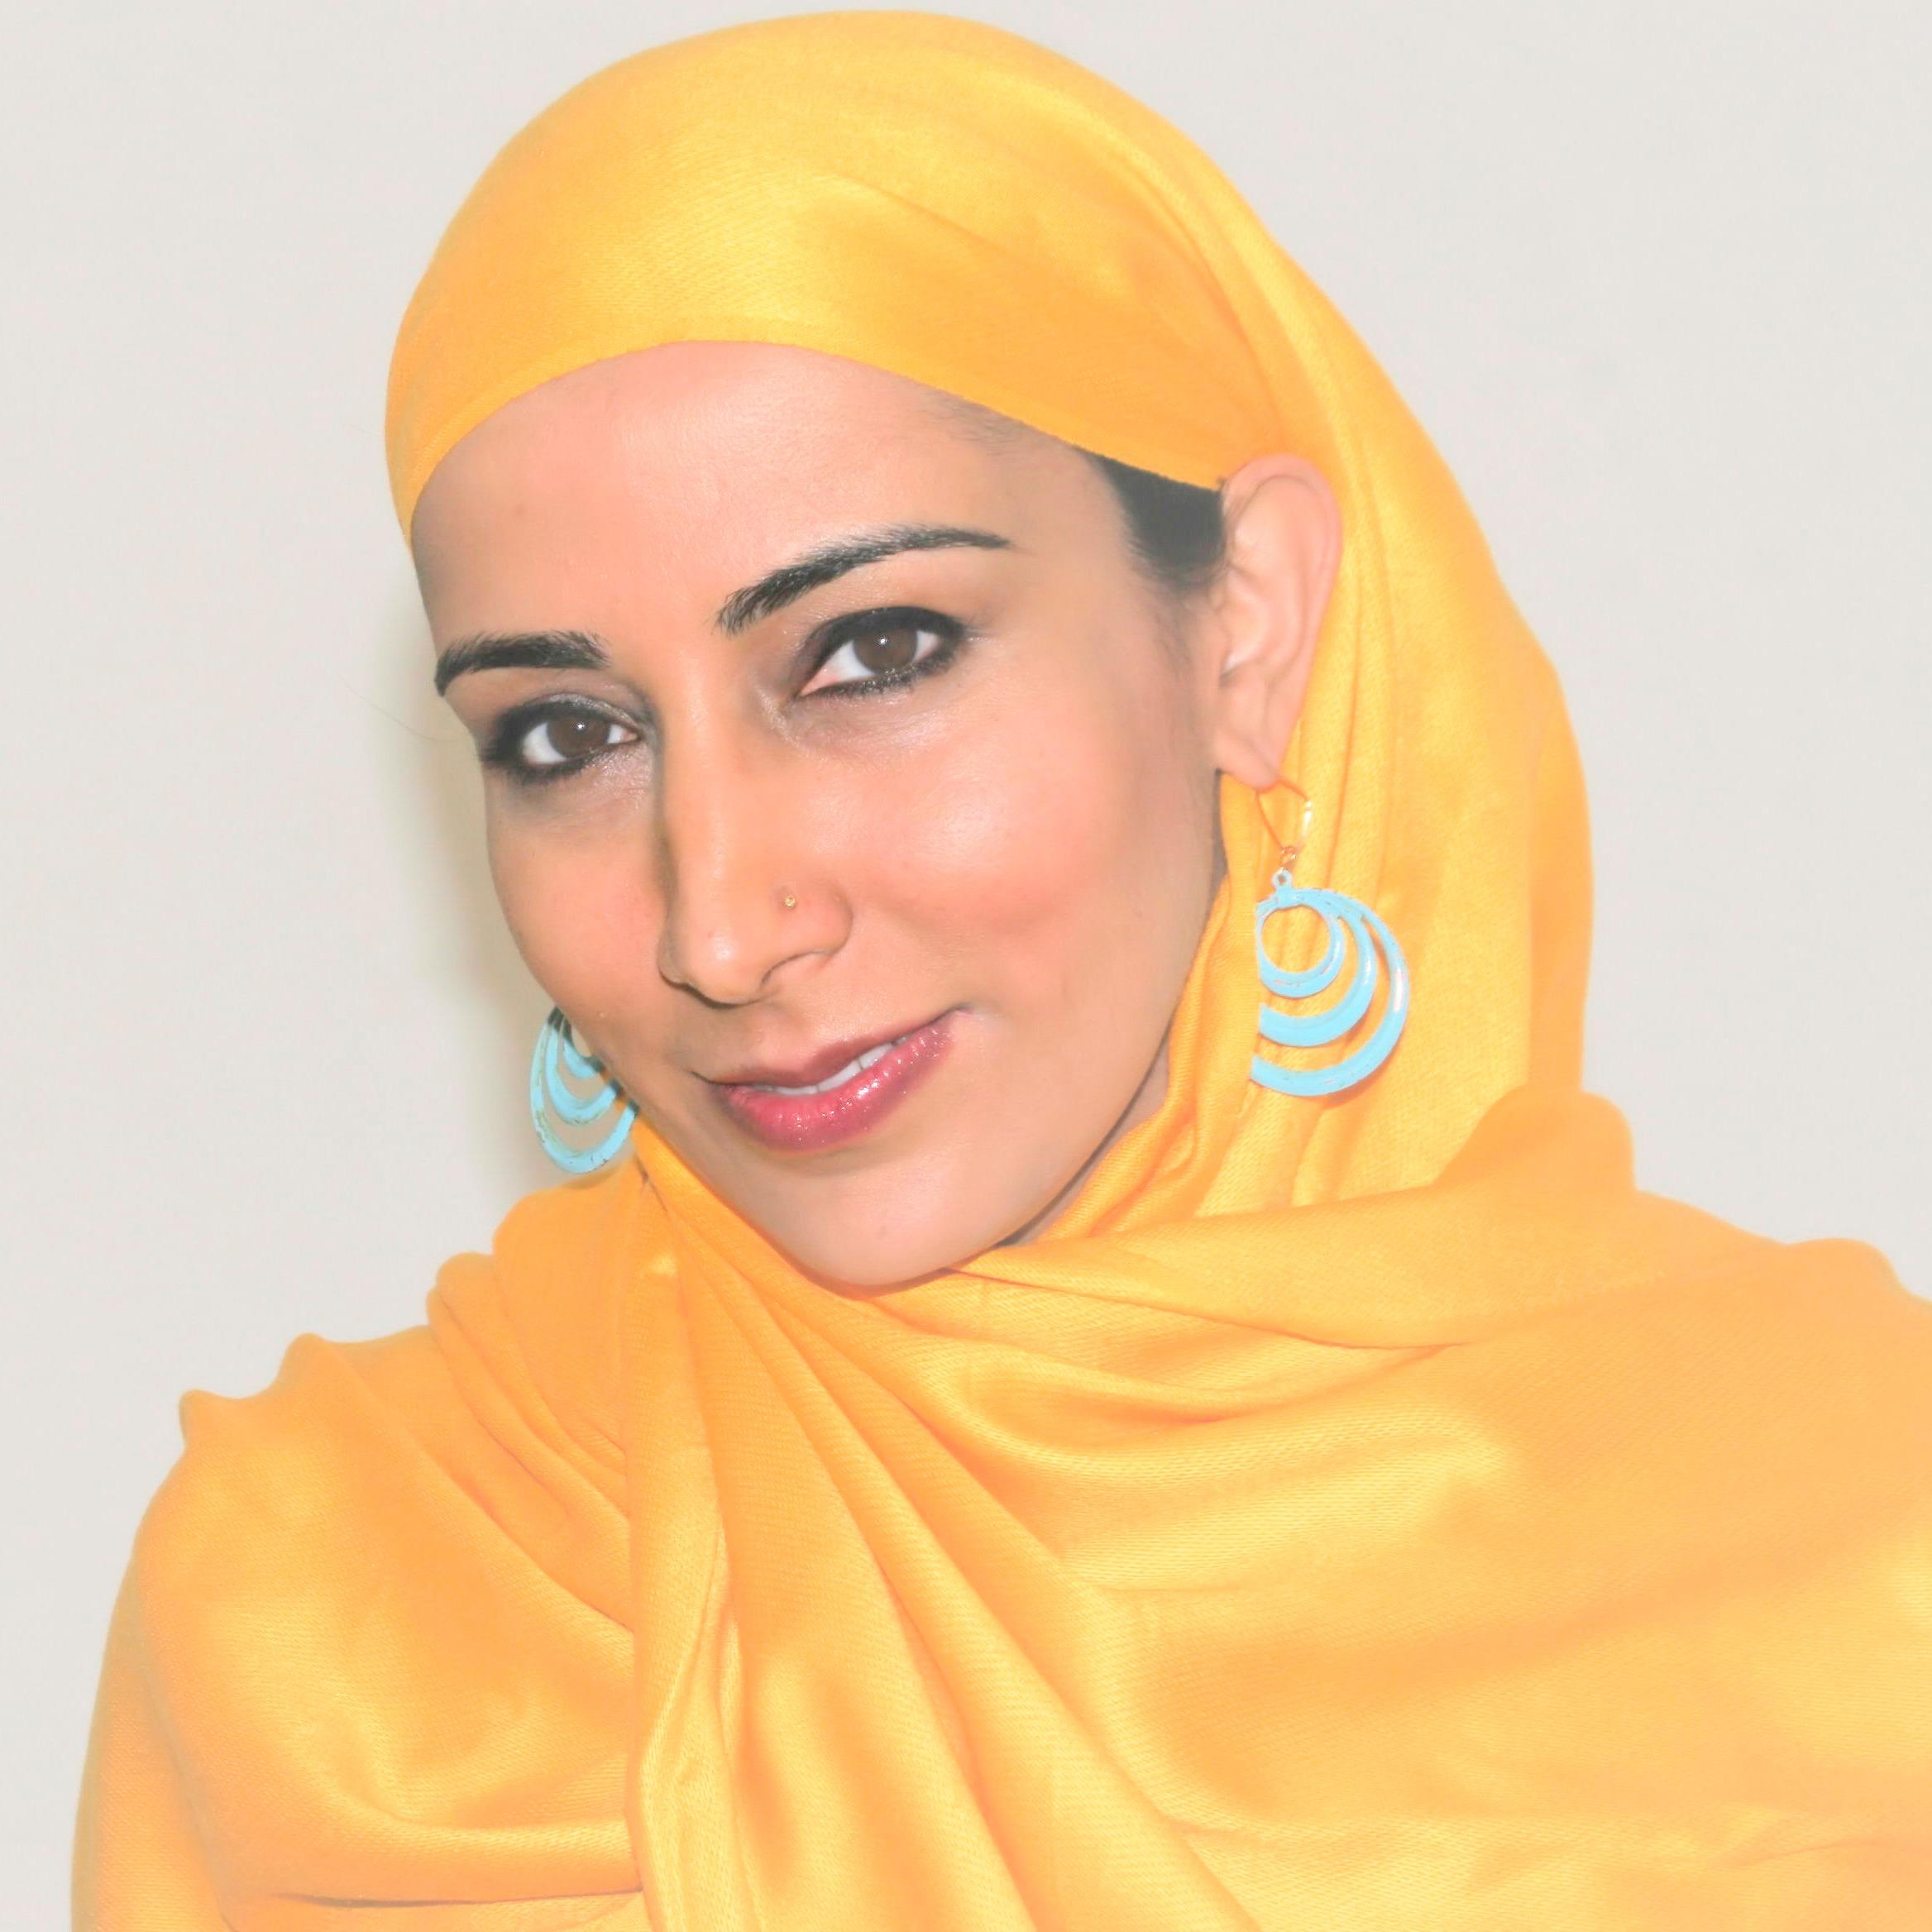 Najeeba Syeed, a South Asian Muslim American woman wearing a yellow headscarf